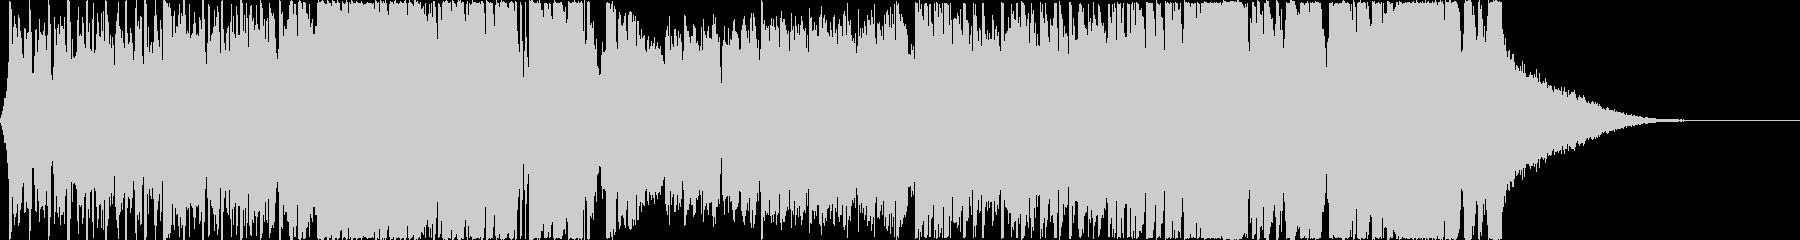 Slapベースが印象的なロックの未再生の波形